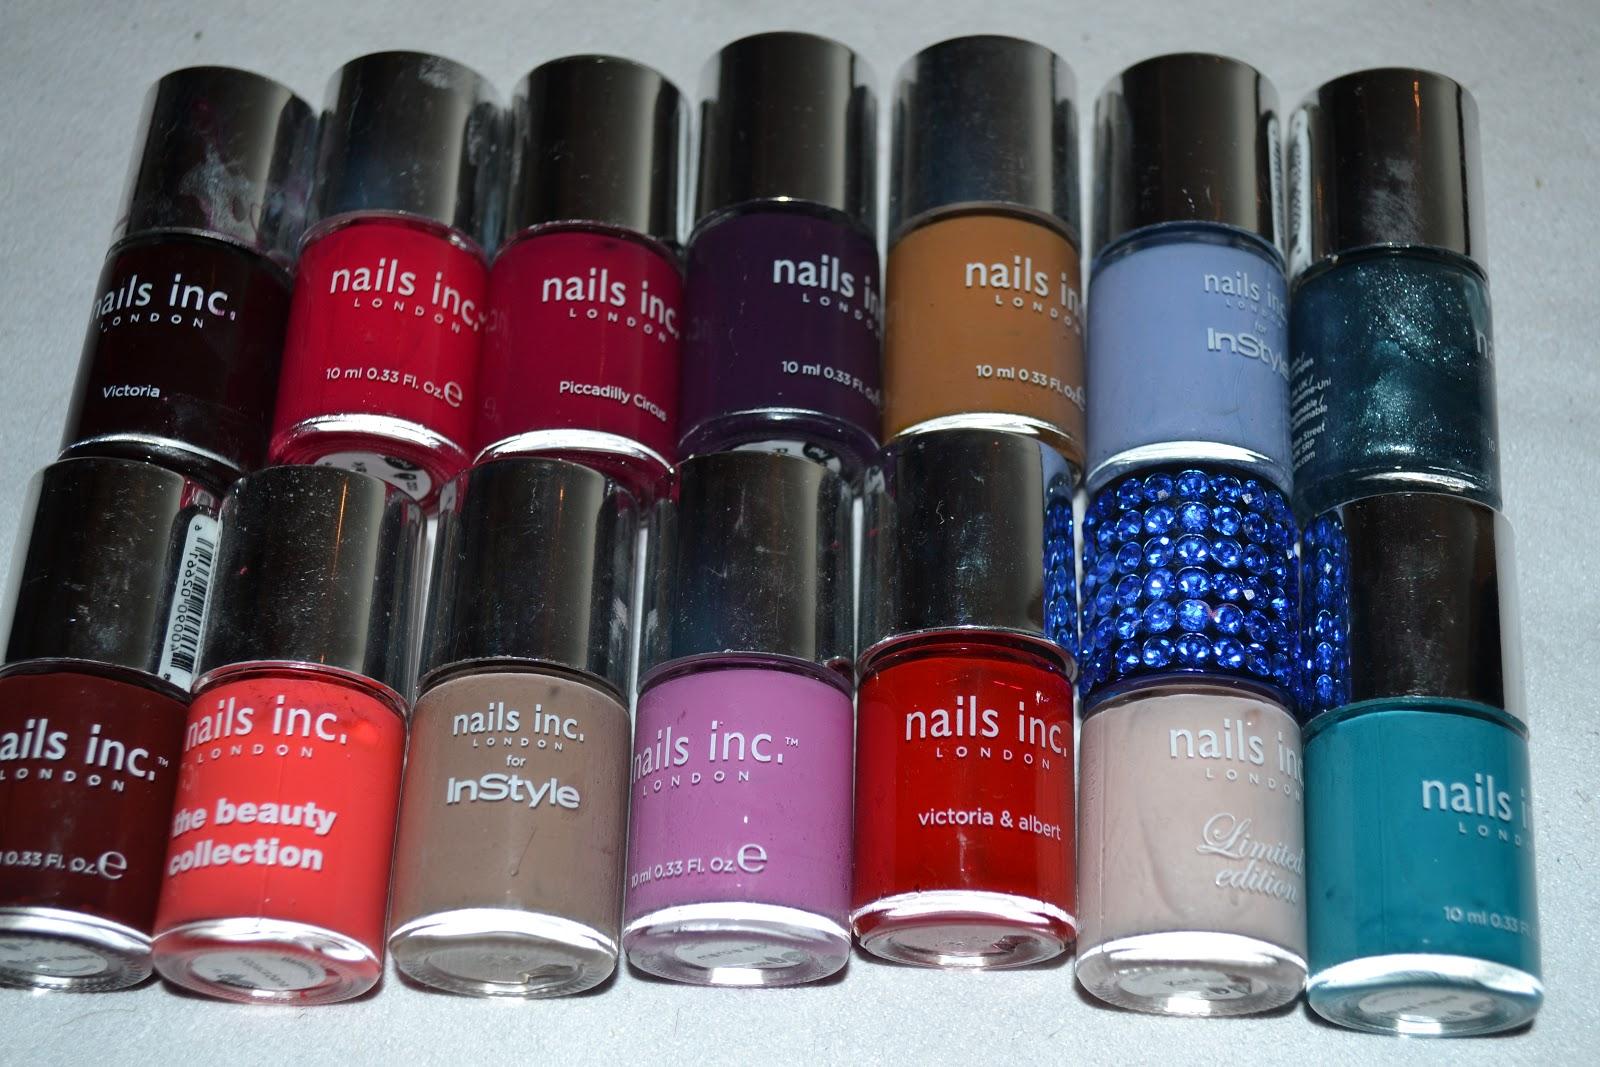 Forevermissvanity - A UK Lifestyle Blogger : Nail Inc for Glamour ...